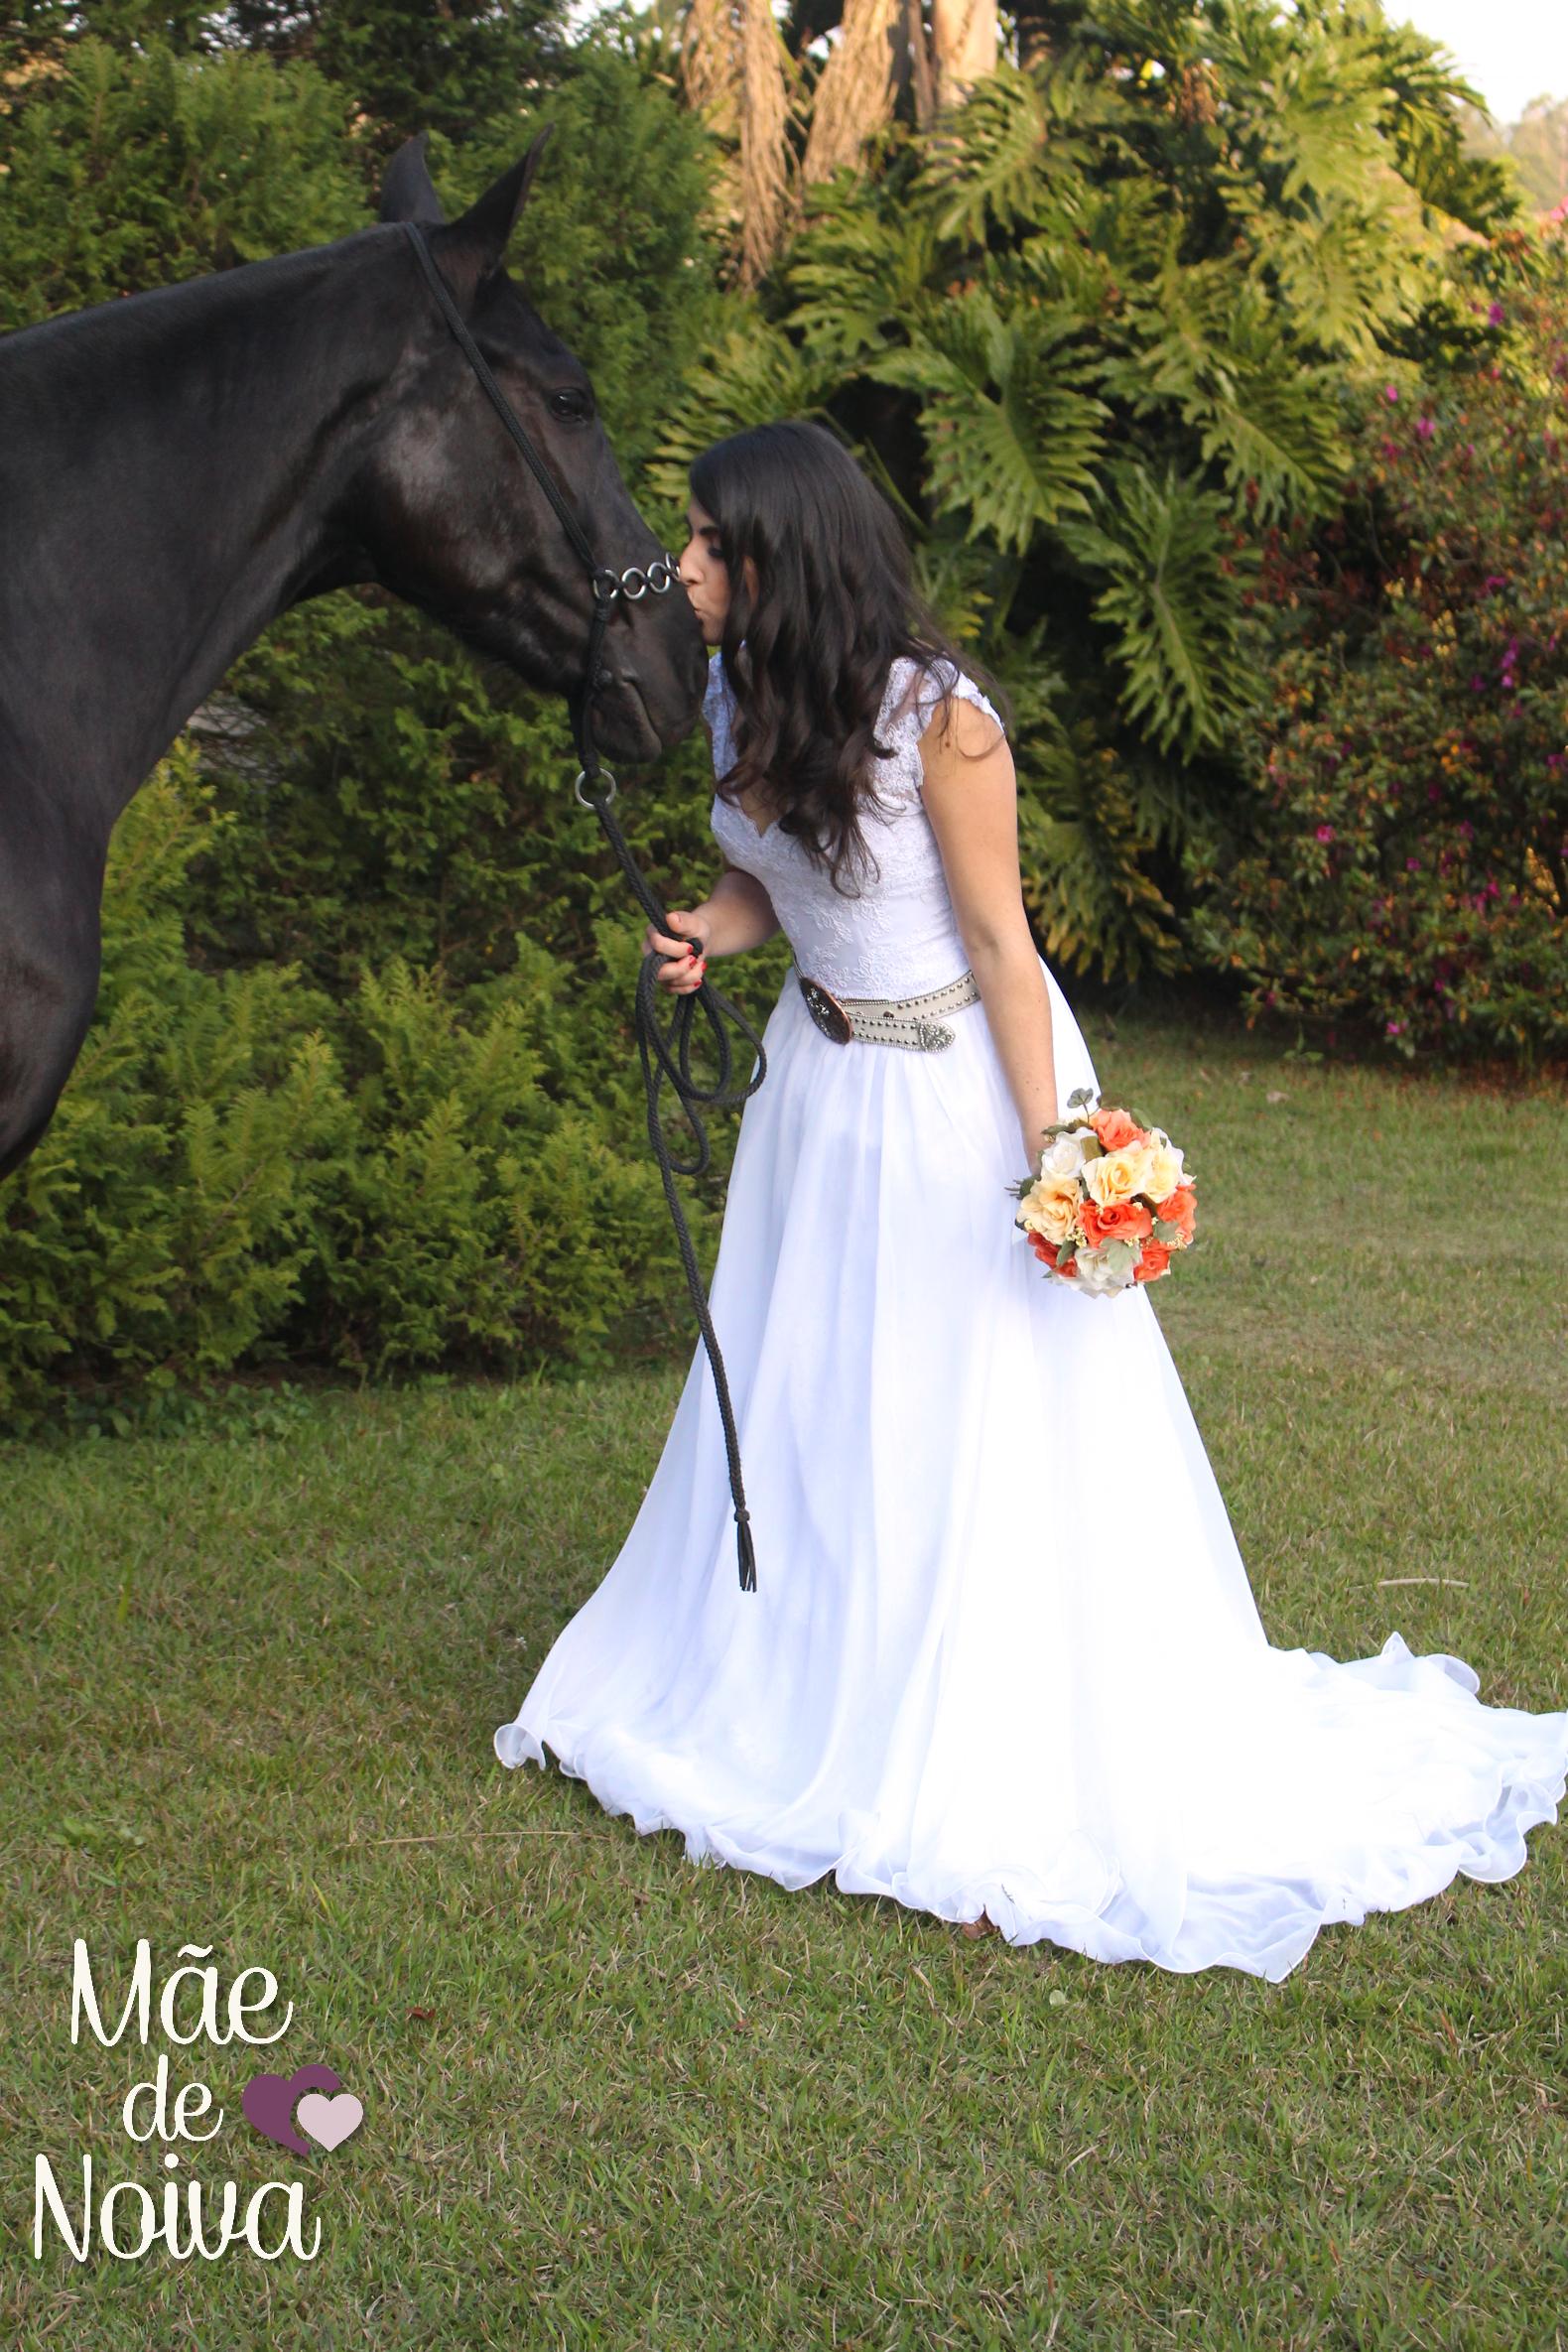 fe67abd540 Noiva country, noiva do campo, noiva vestido leve, noiva casamento no campo,